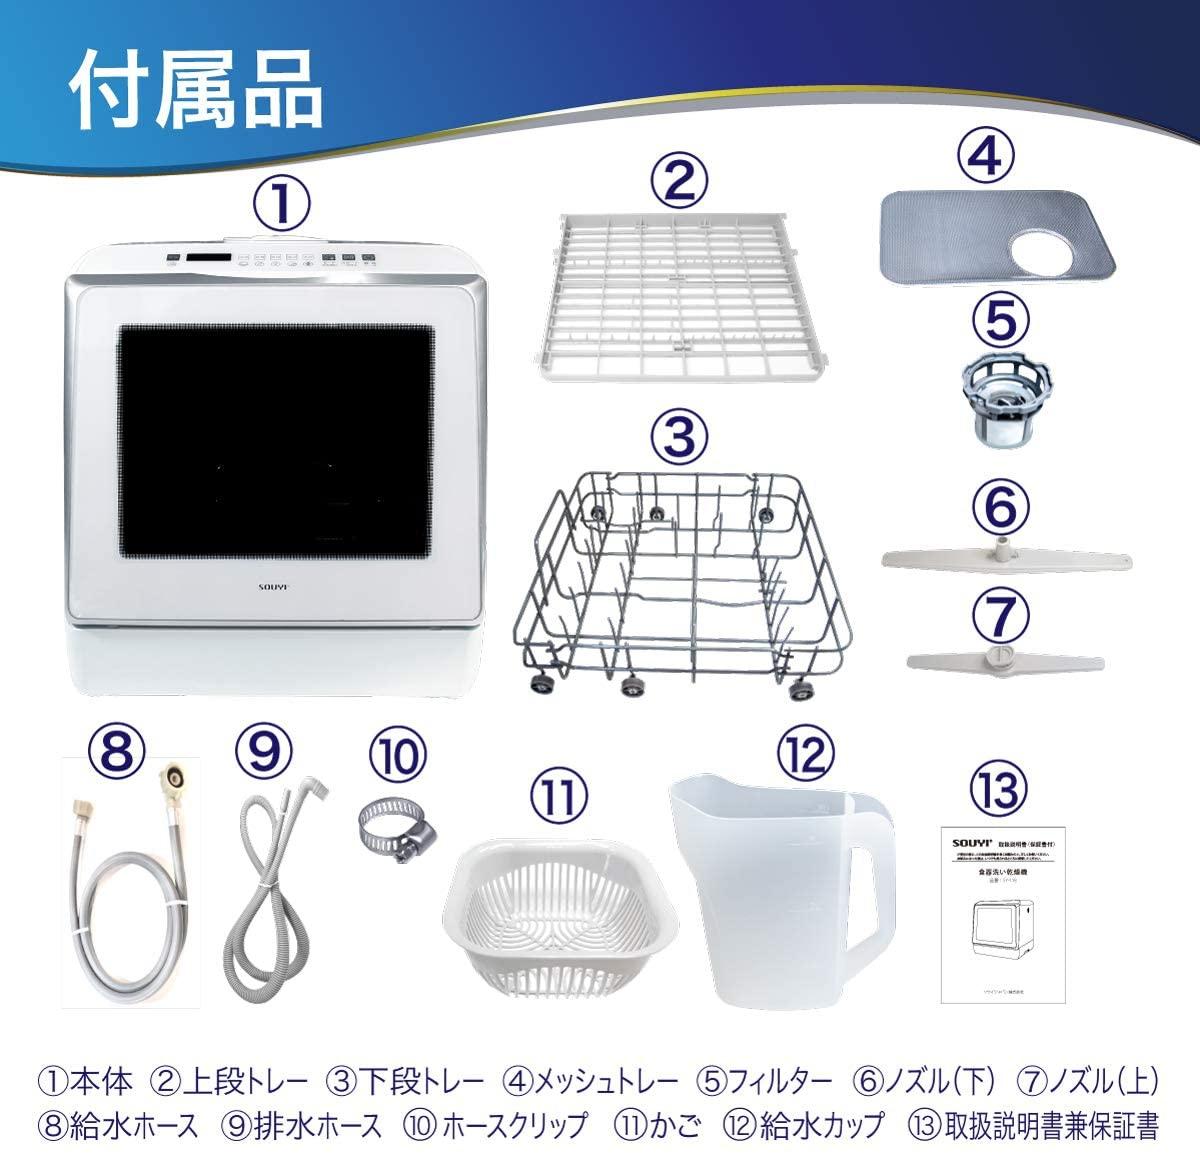 SOUYI(ソウイ) 食器洗い乾燥機 SY-118の商品画像9